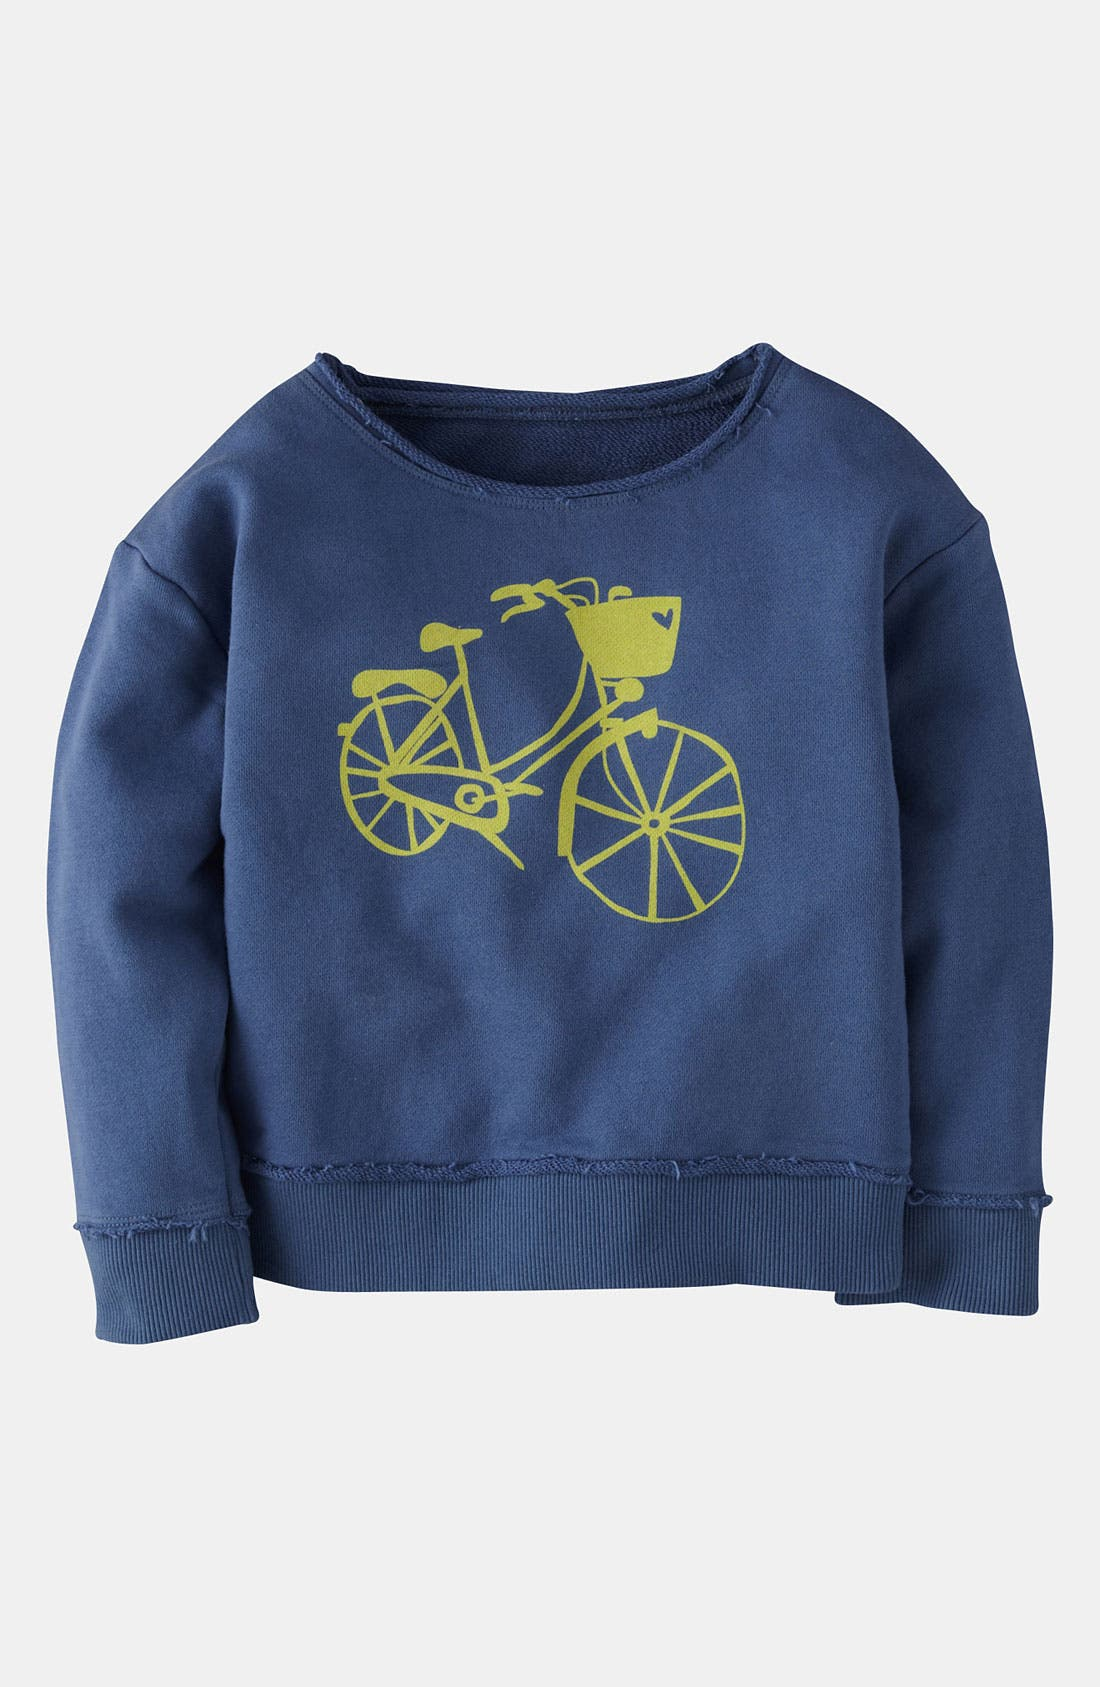 Alternate Image 1 Selected - Mini Boden 'Washed Logo' Sweatshirt (Little Girls & Big Girls)